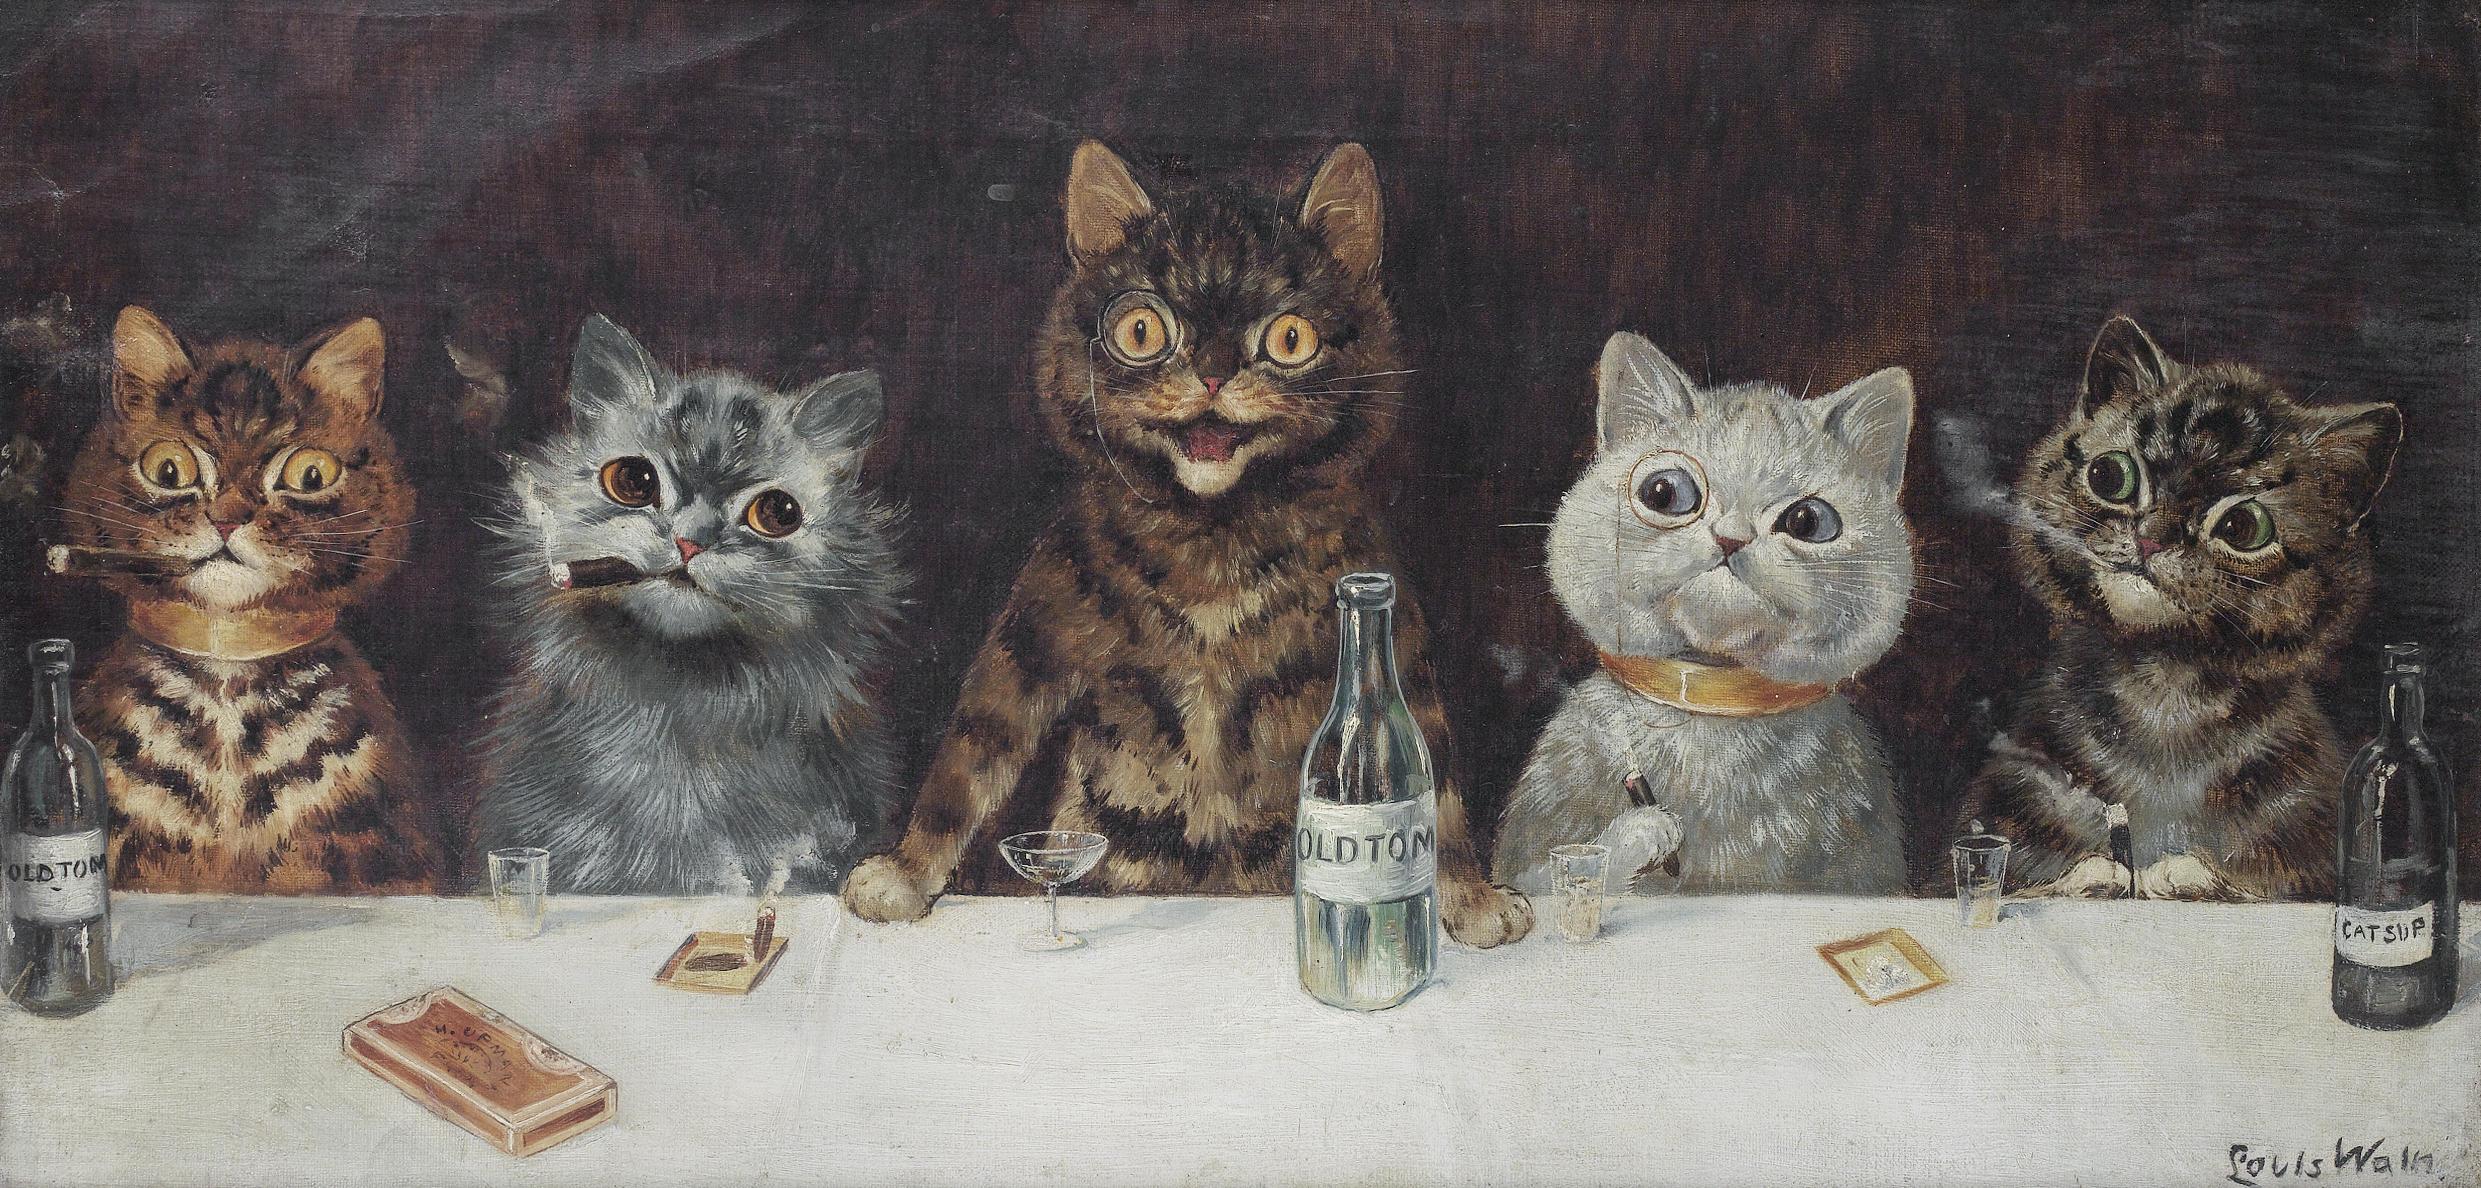 ed3e054e137 The Man Who Made Cats Laugh  Louis Wain - greydogtales